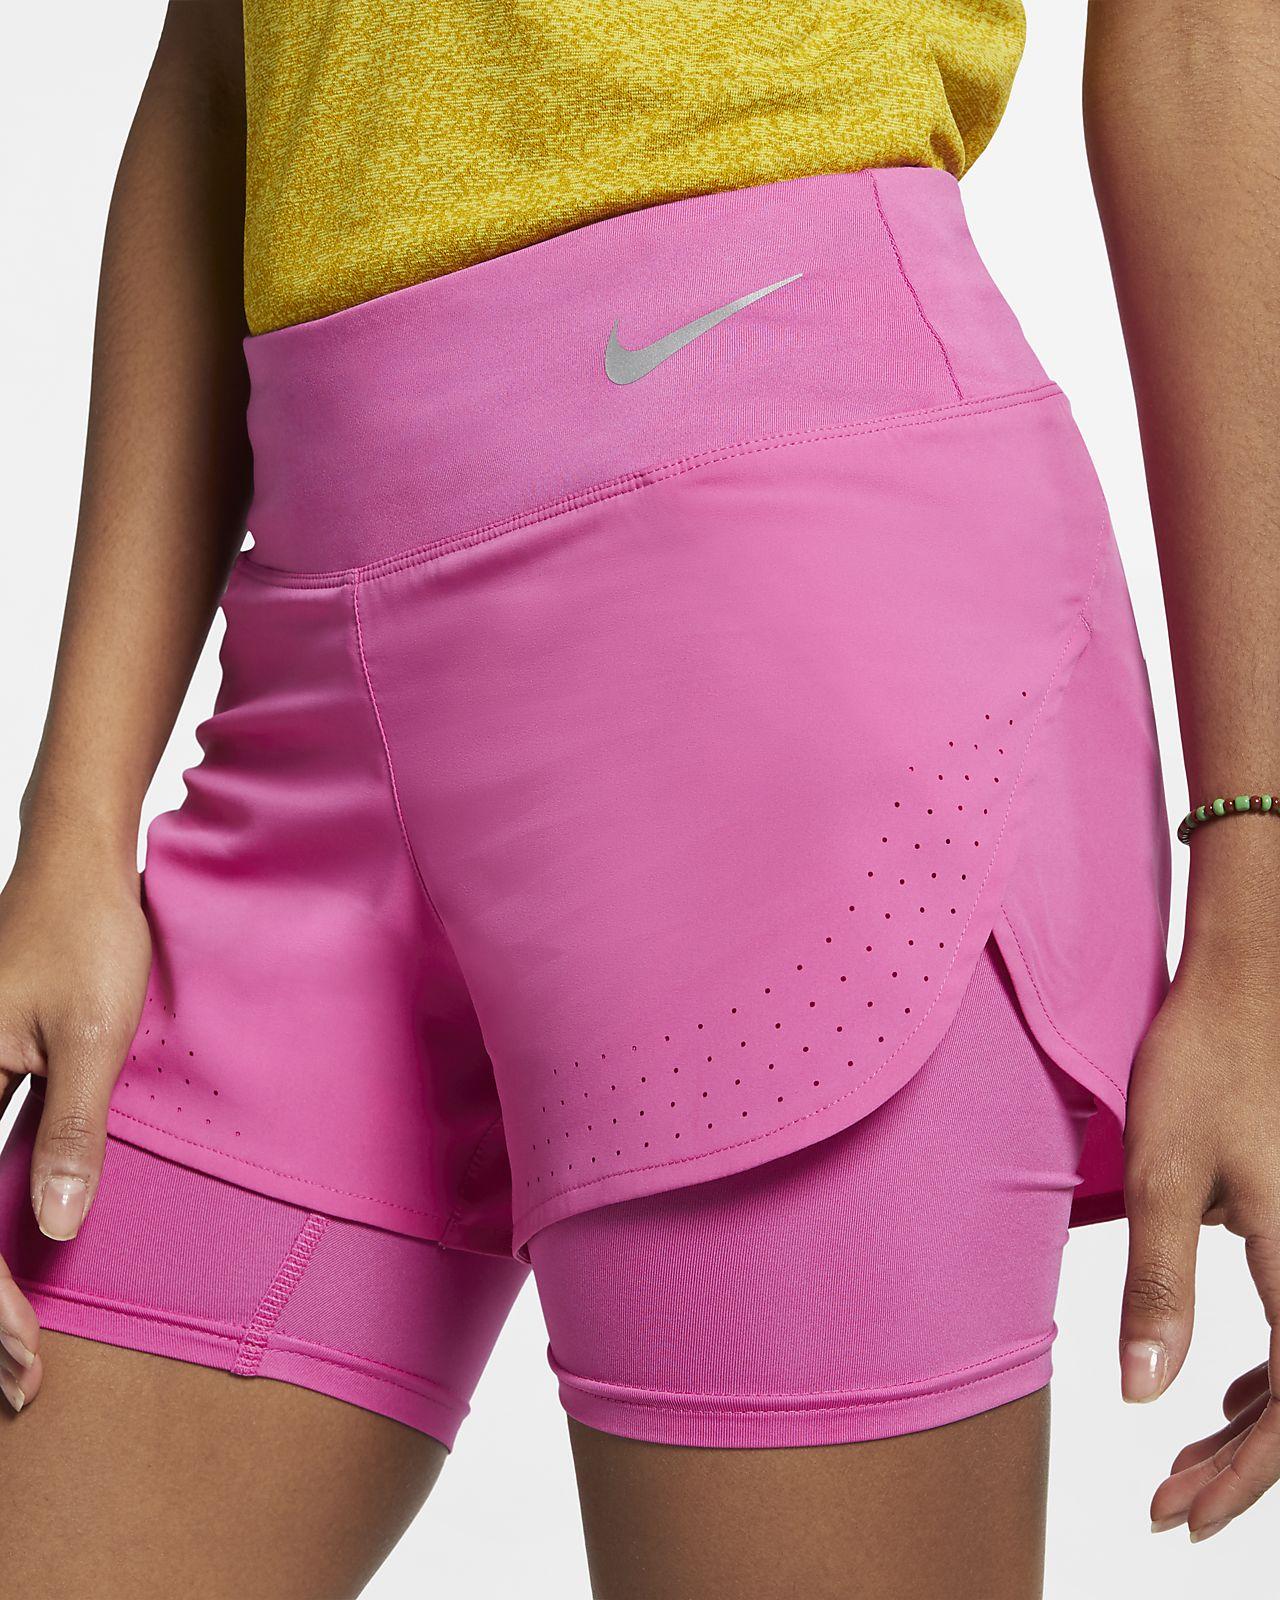 Nike Eclipse Women's 2-in-1 Running Shorts